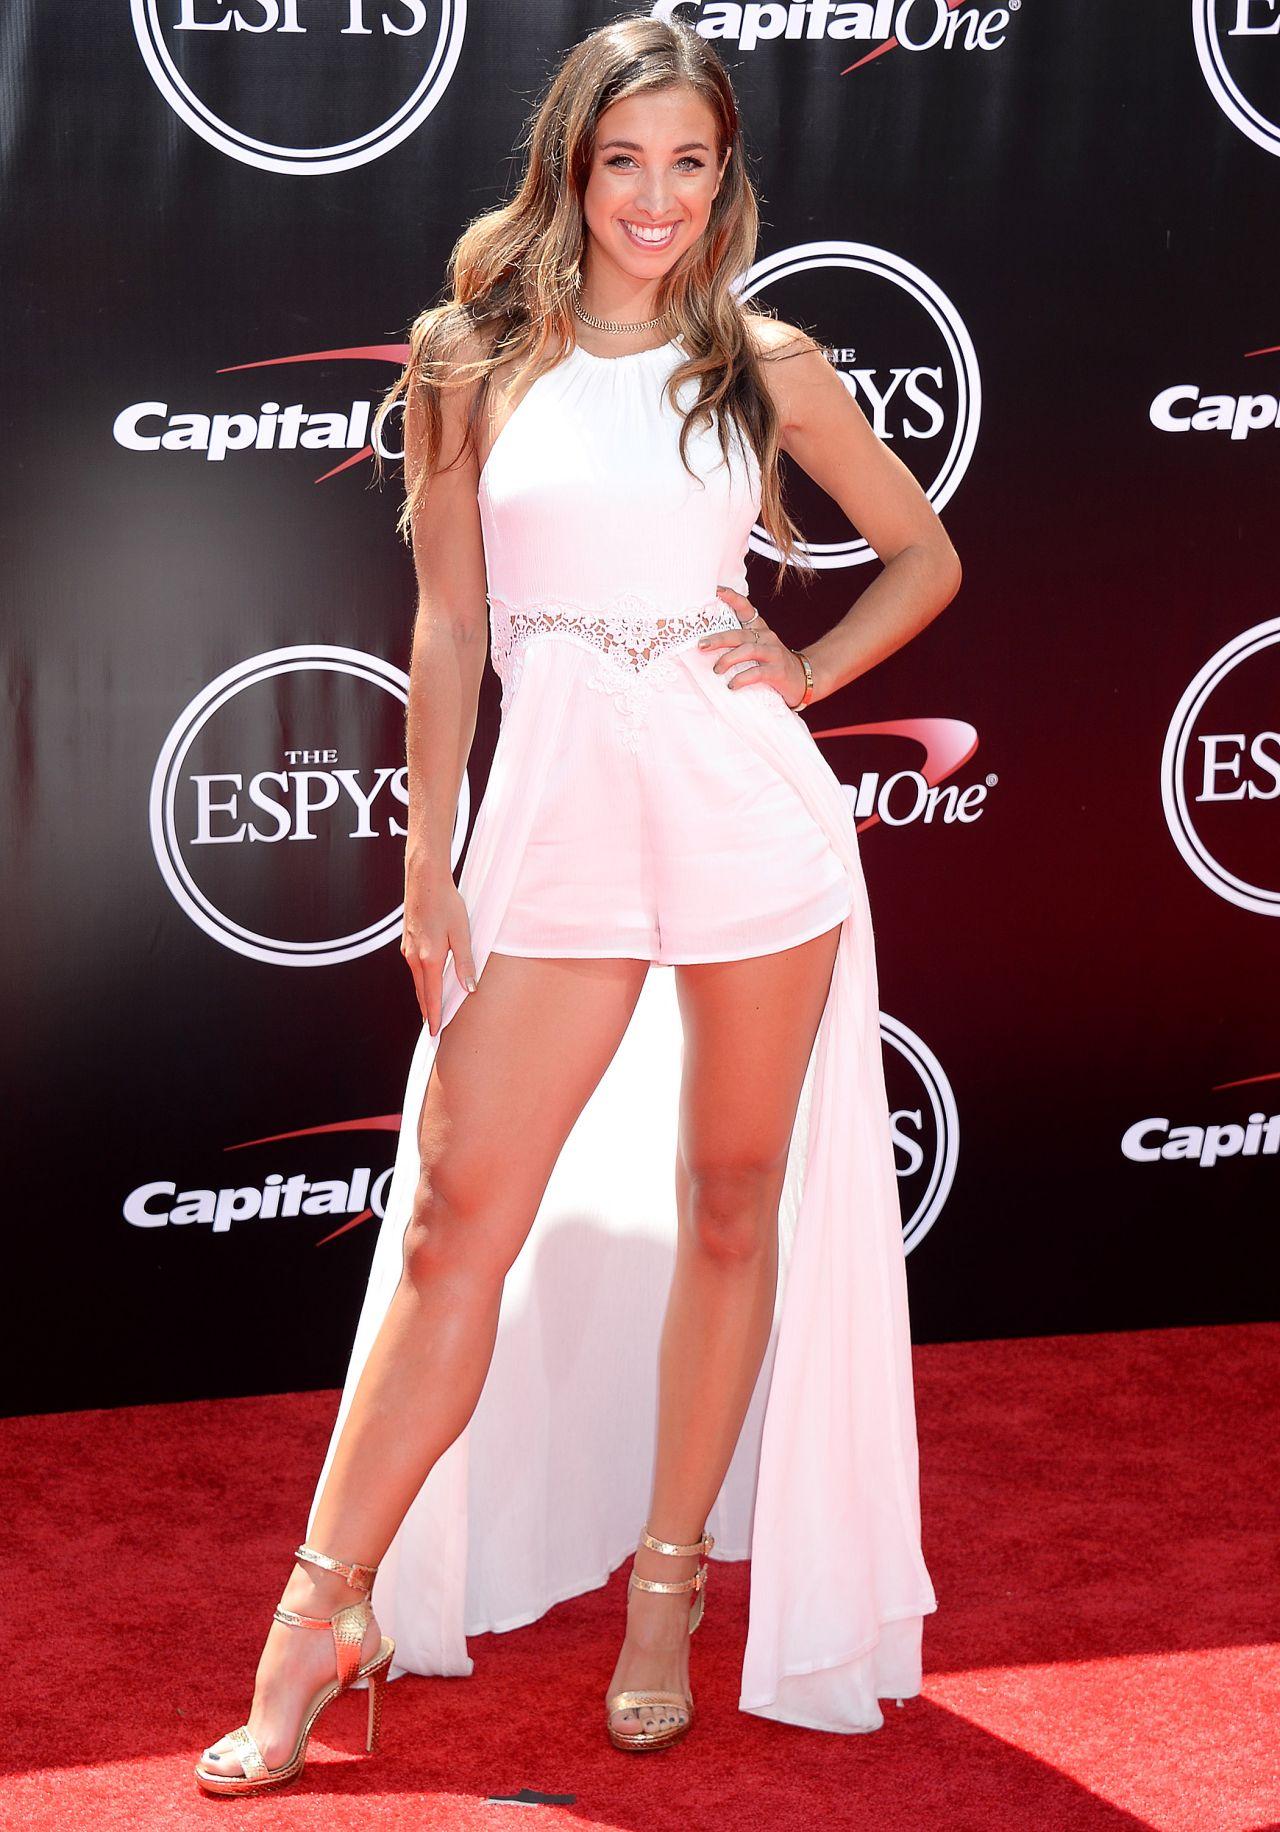 Kate Austin Espy Awards 2016 In Los Angeles